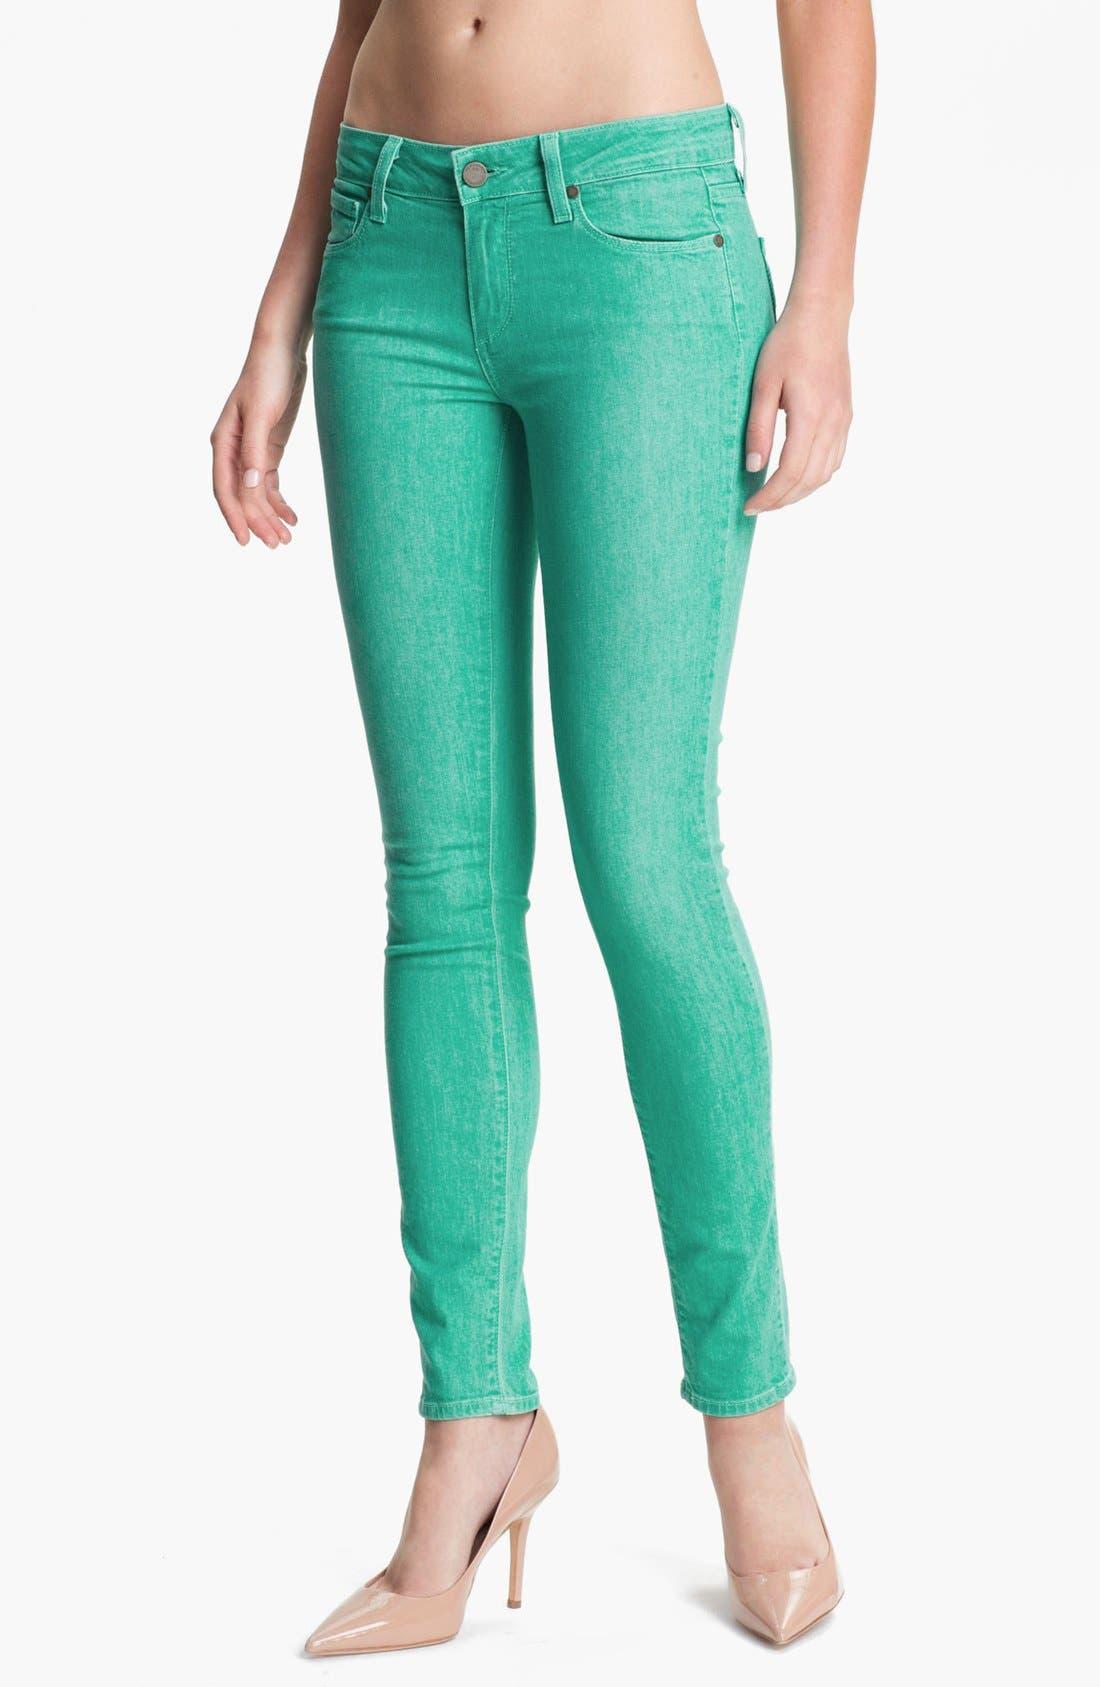 Alternate Image 1 Selected - Paige Denim 'Verdugo' Skinny Stretch Denim Jeans (Spearmint)